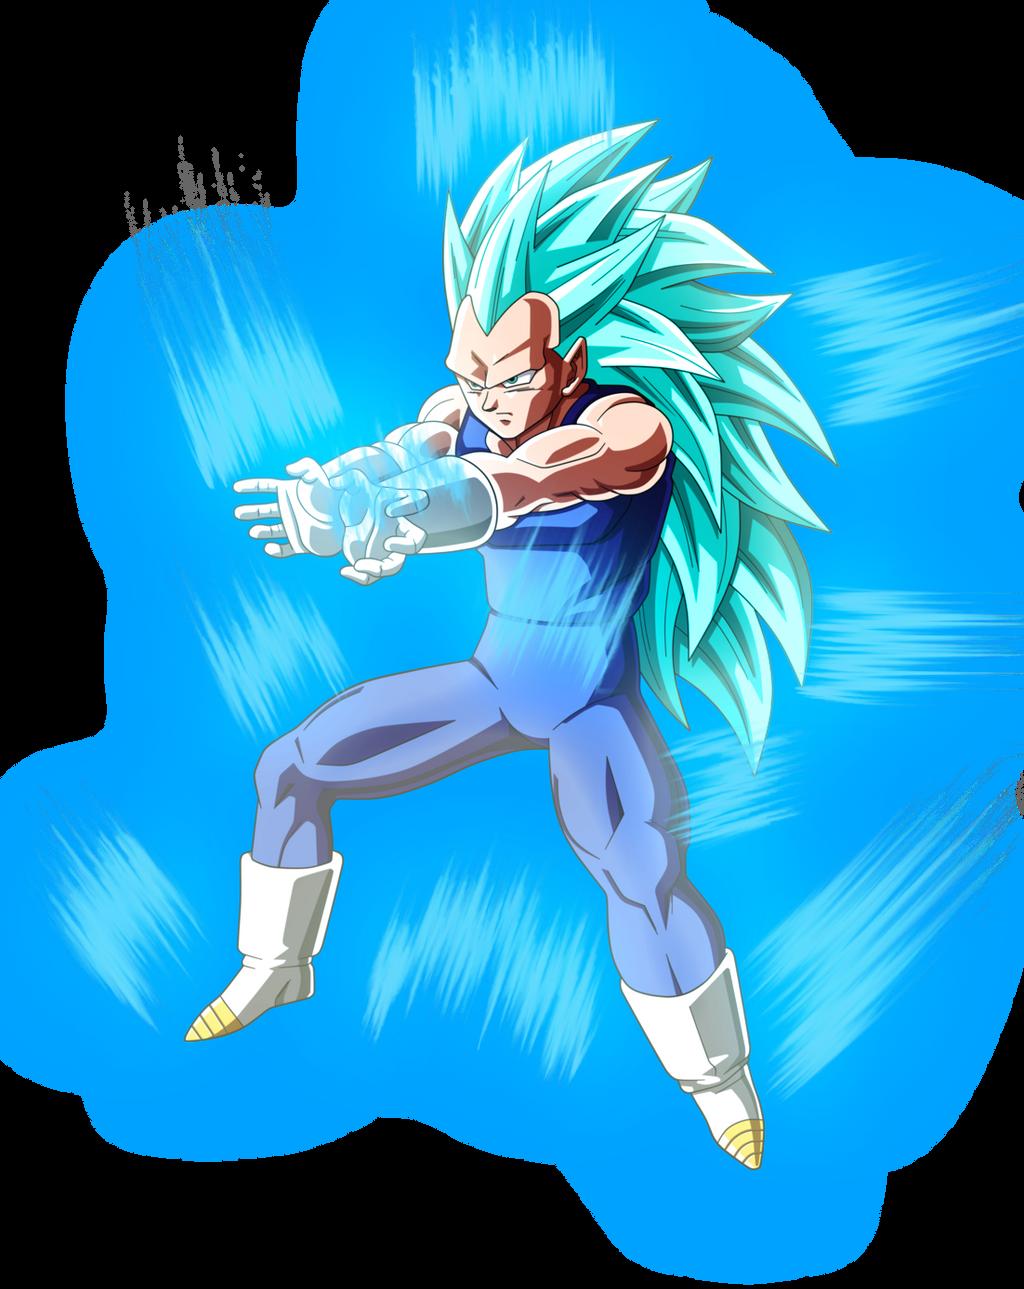 Vegeta Ssj Blue 3 Final Flash Pose By Alphagreywind On Goku Vs